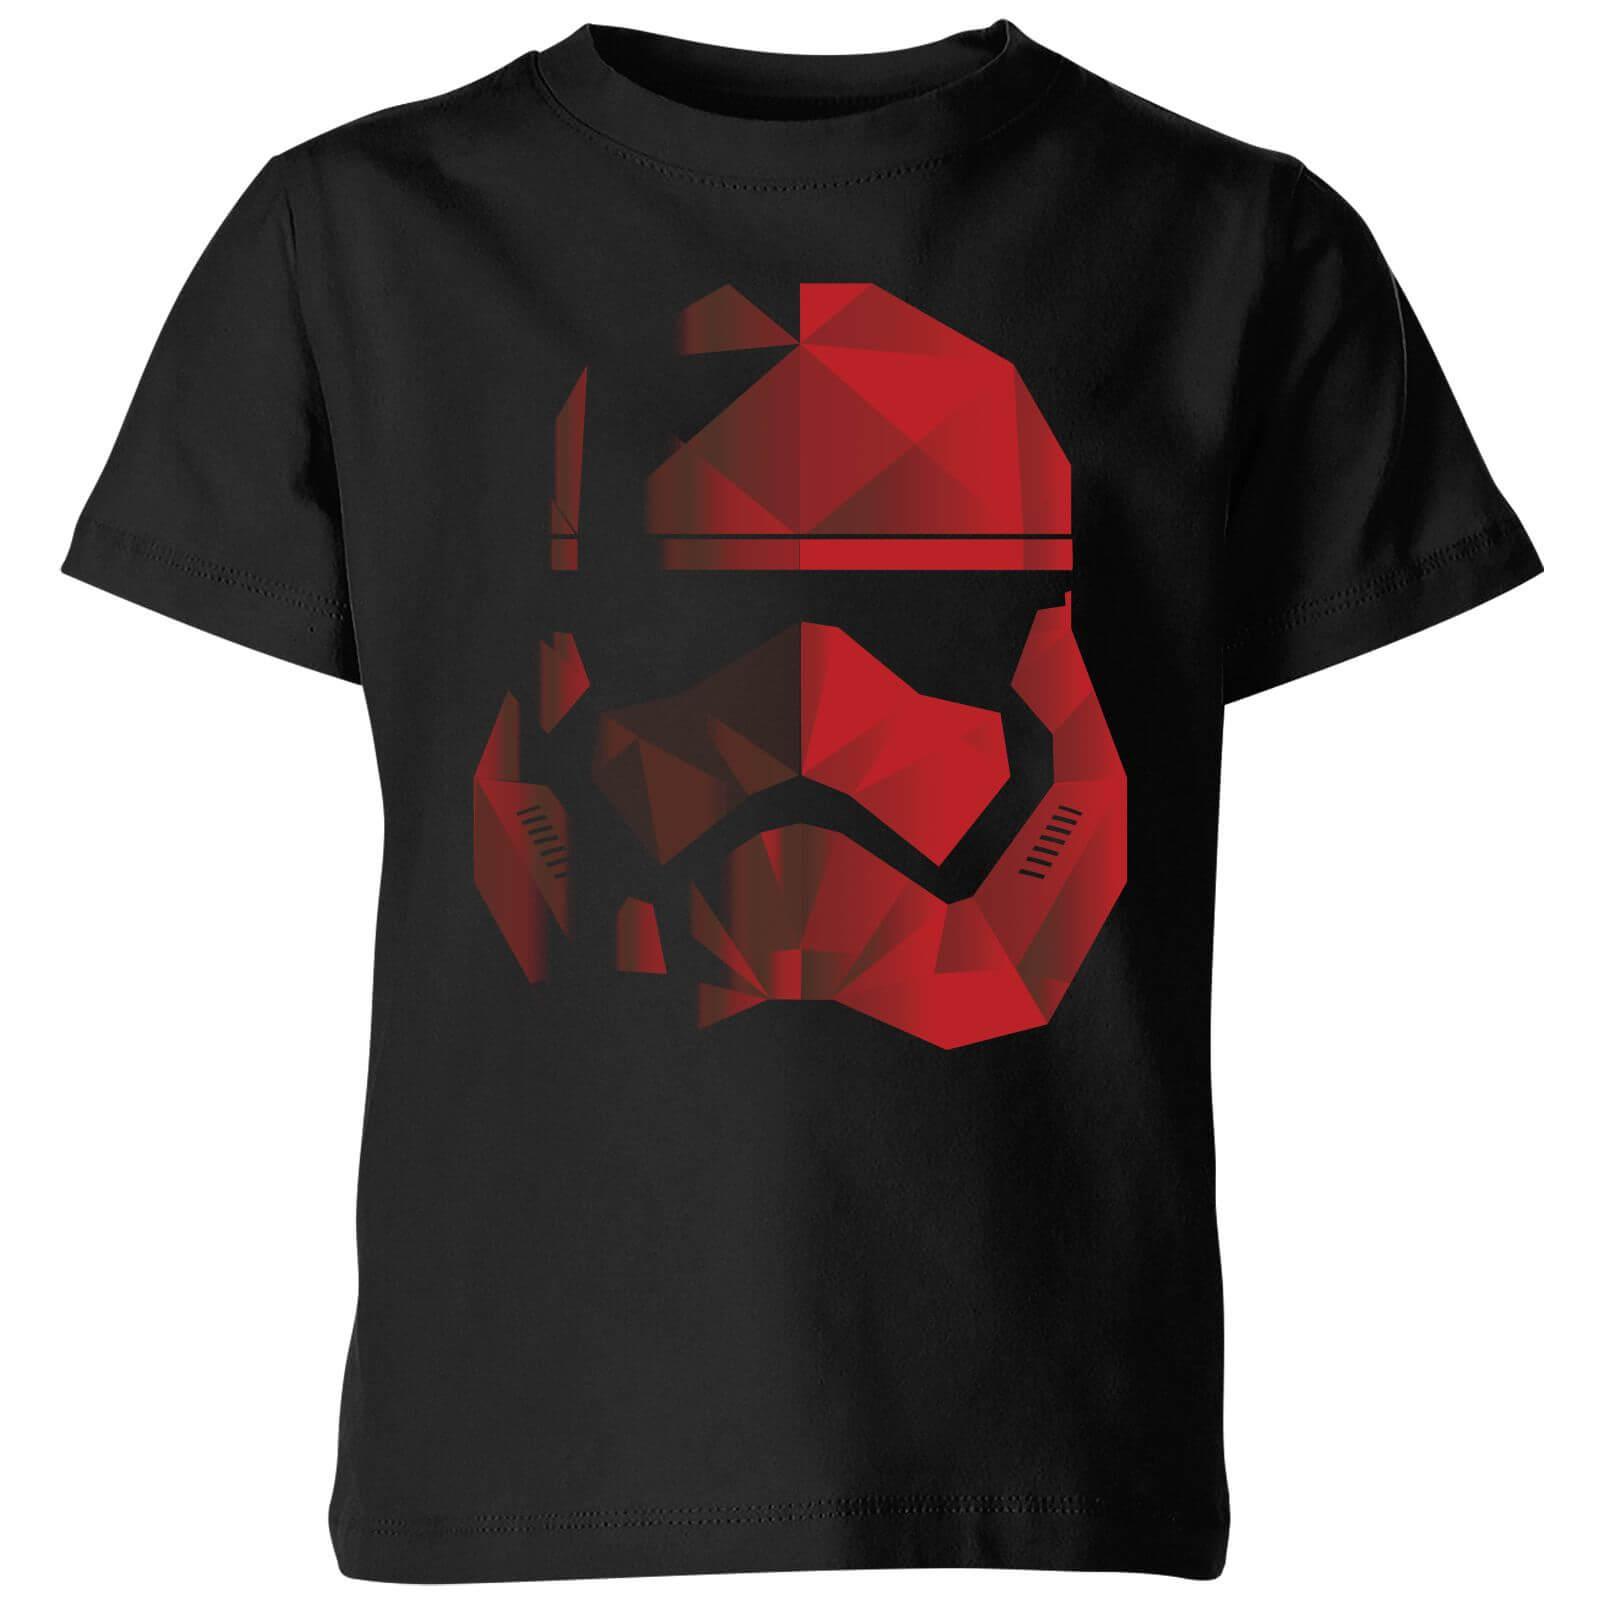 Star Wars T-Shirt Enfant Casque Stormtrooper Effet Cubiste - Star Wars - Noir - 5-6 ans - Noir